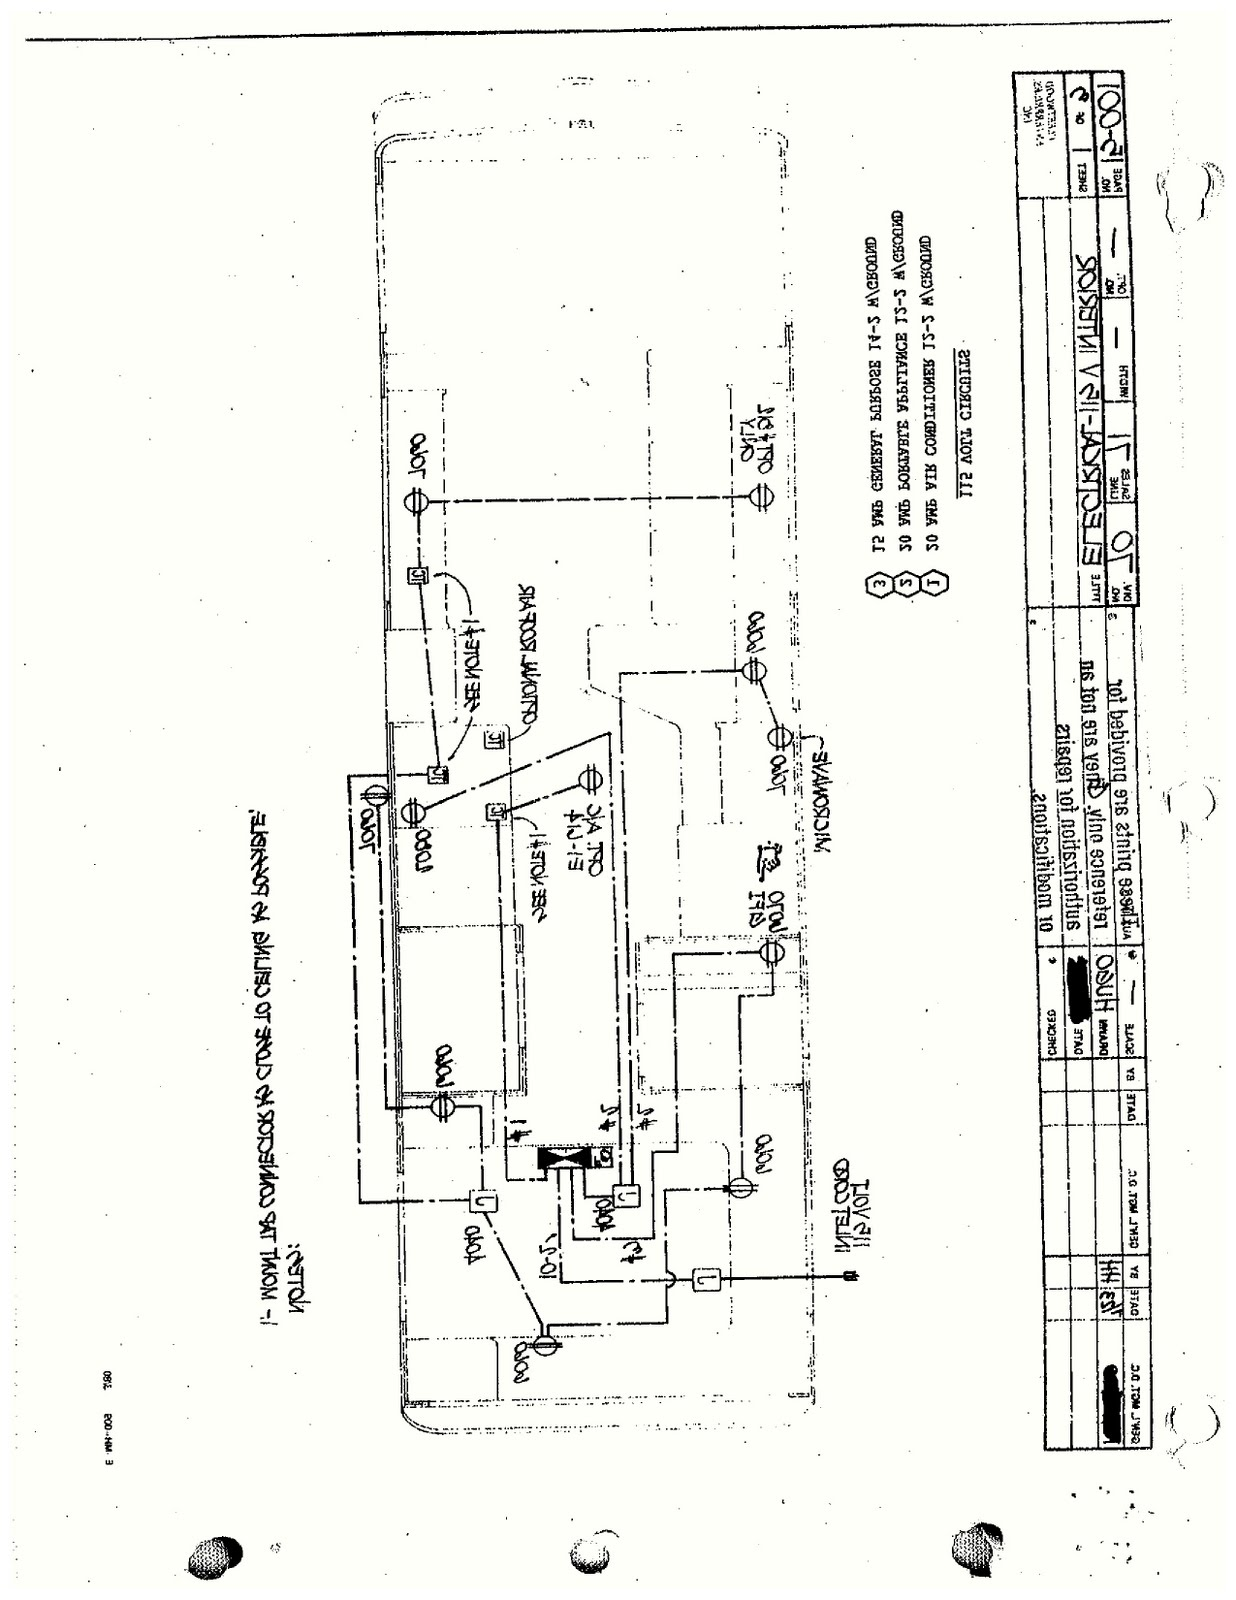 hight resolution of 1987 coleman pop up camper wiring diagram somurich com fleetwood travel trailer wiring fleetwood